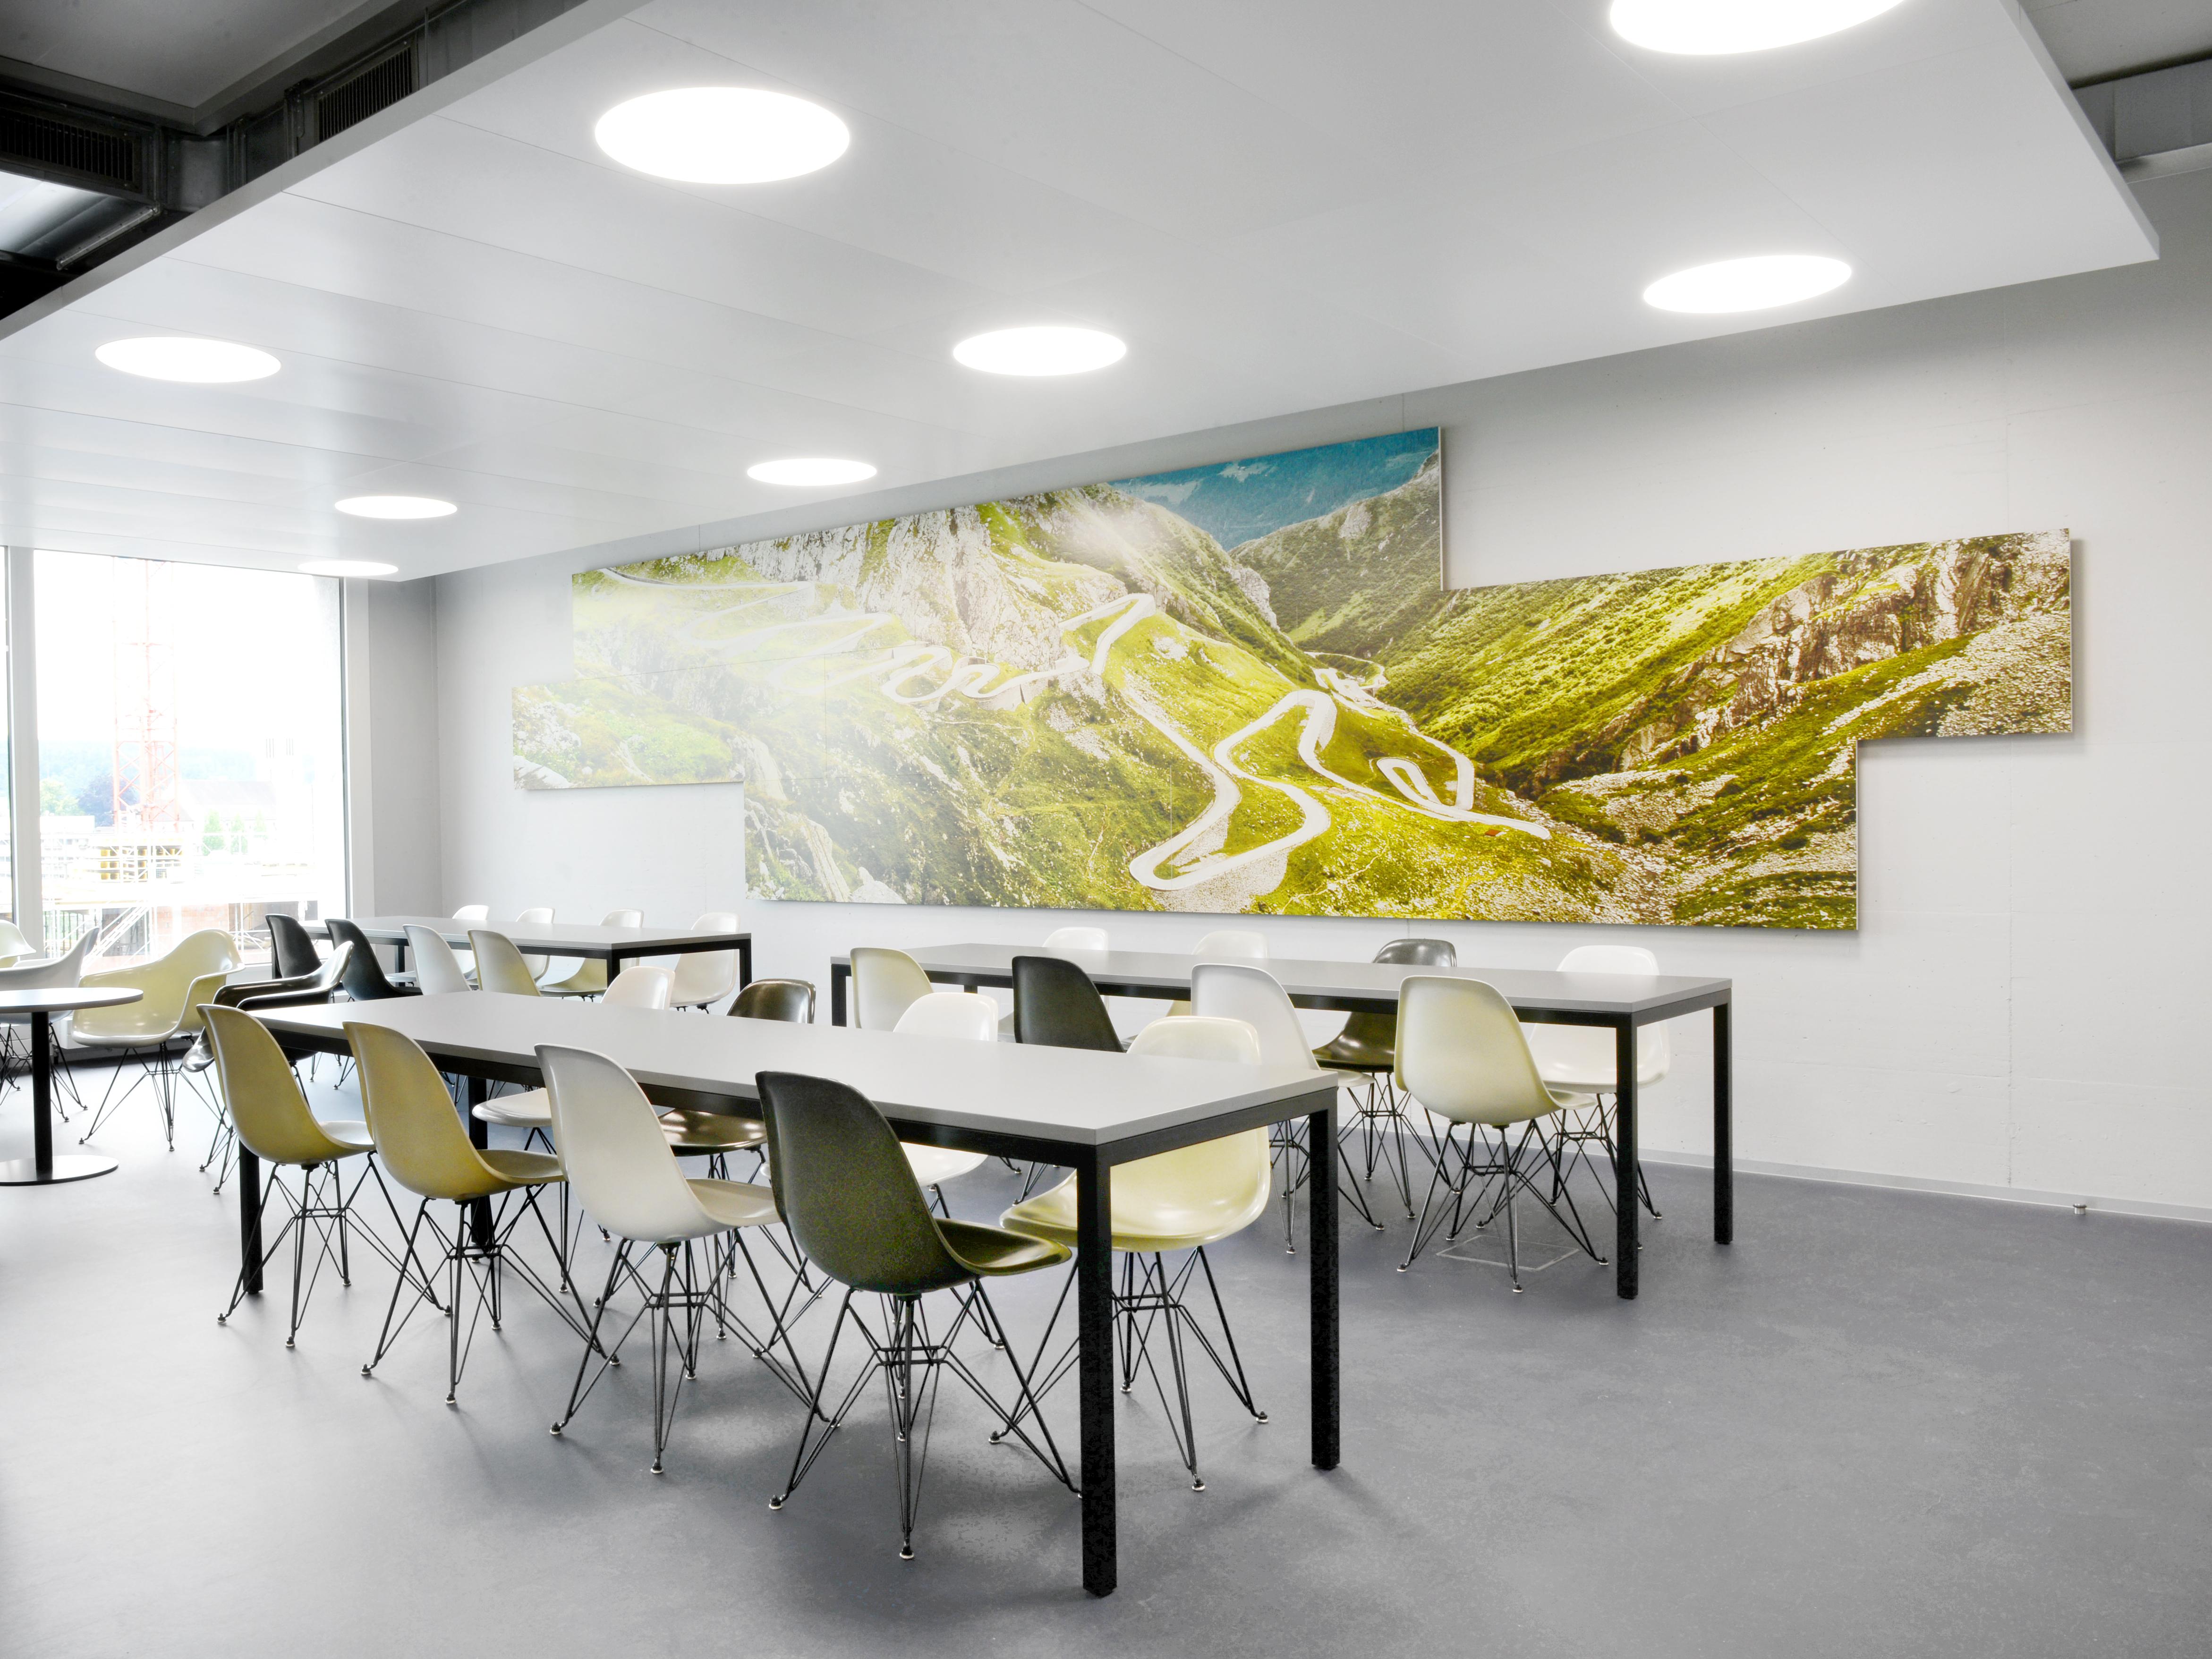 Walo Office Design